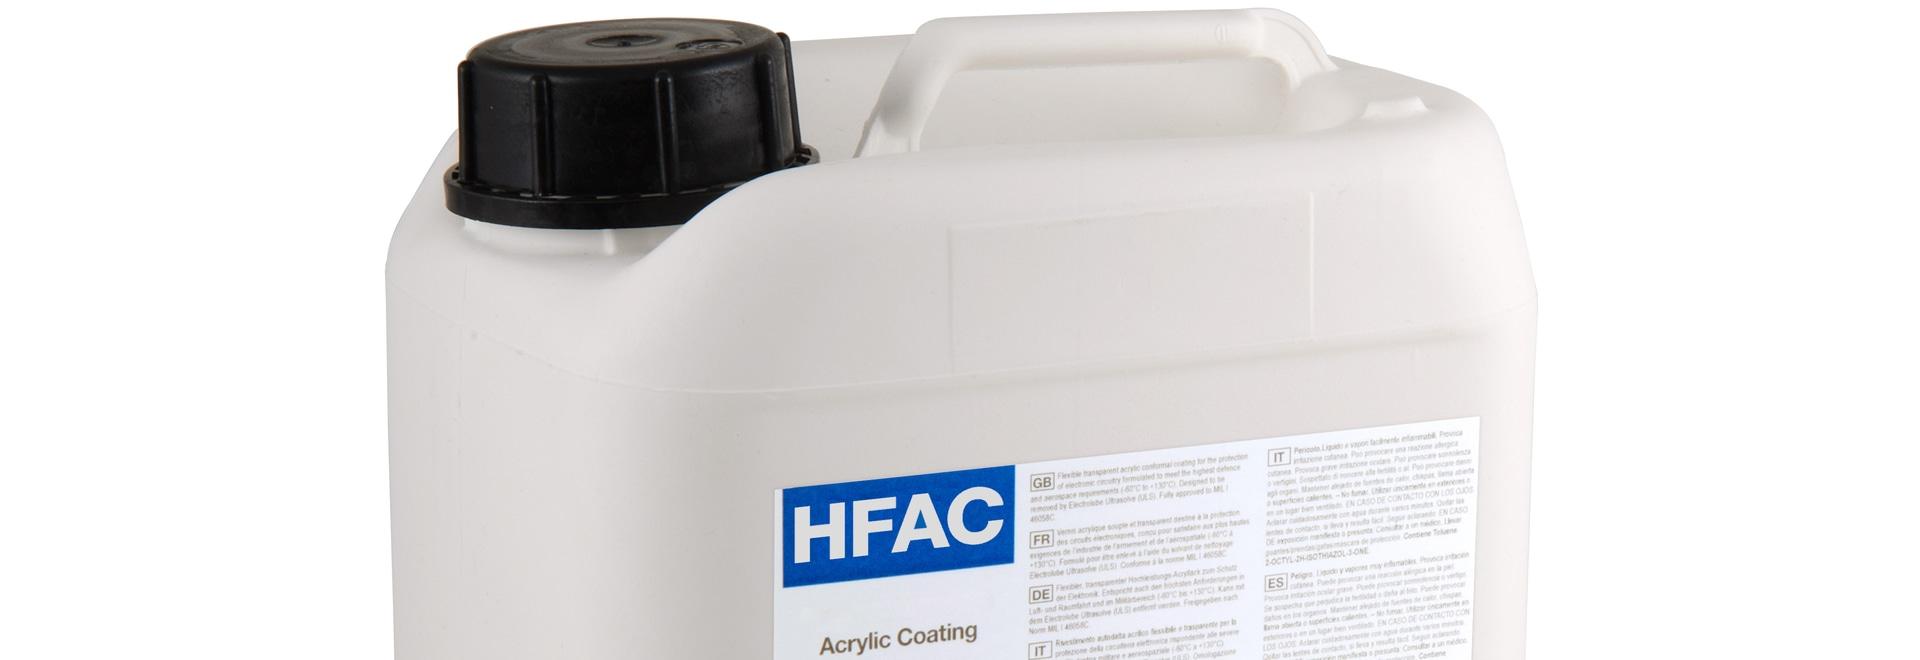 HFAC 5 Liter